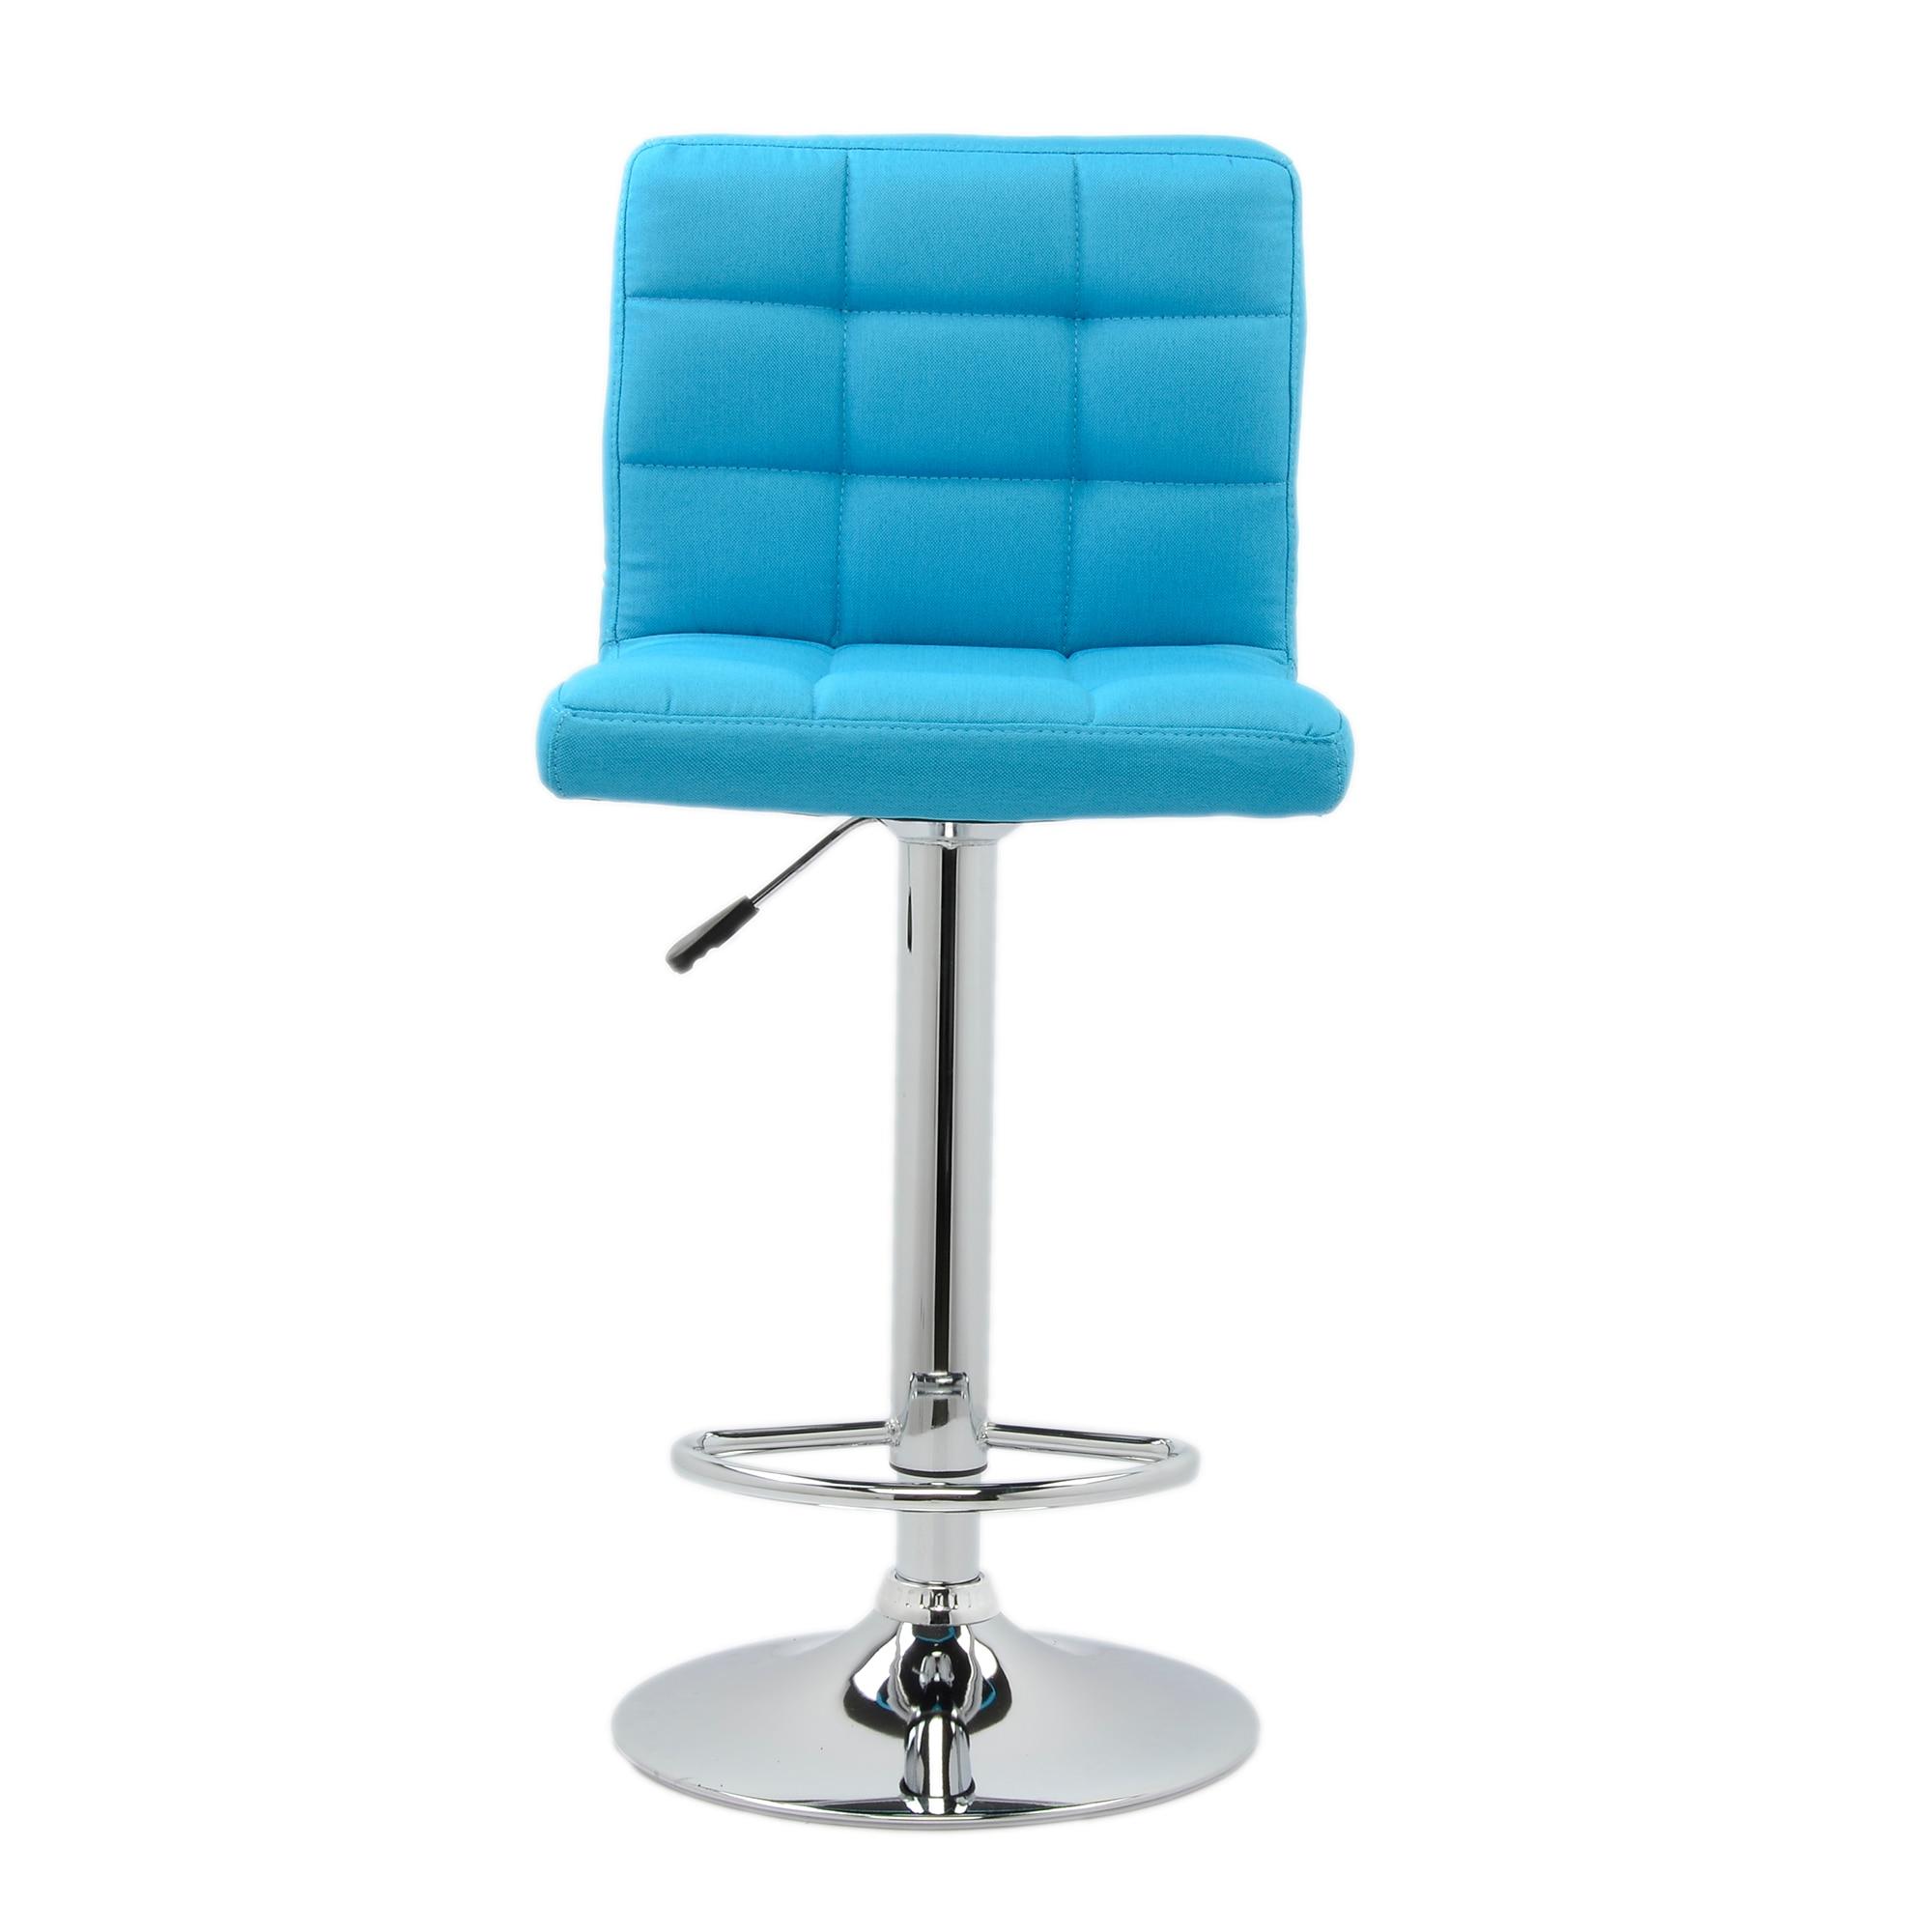 Fotografie Scaun de bar cromat Kring 21, textil, Albastru deschis